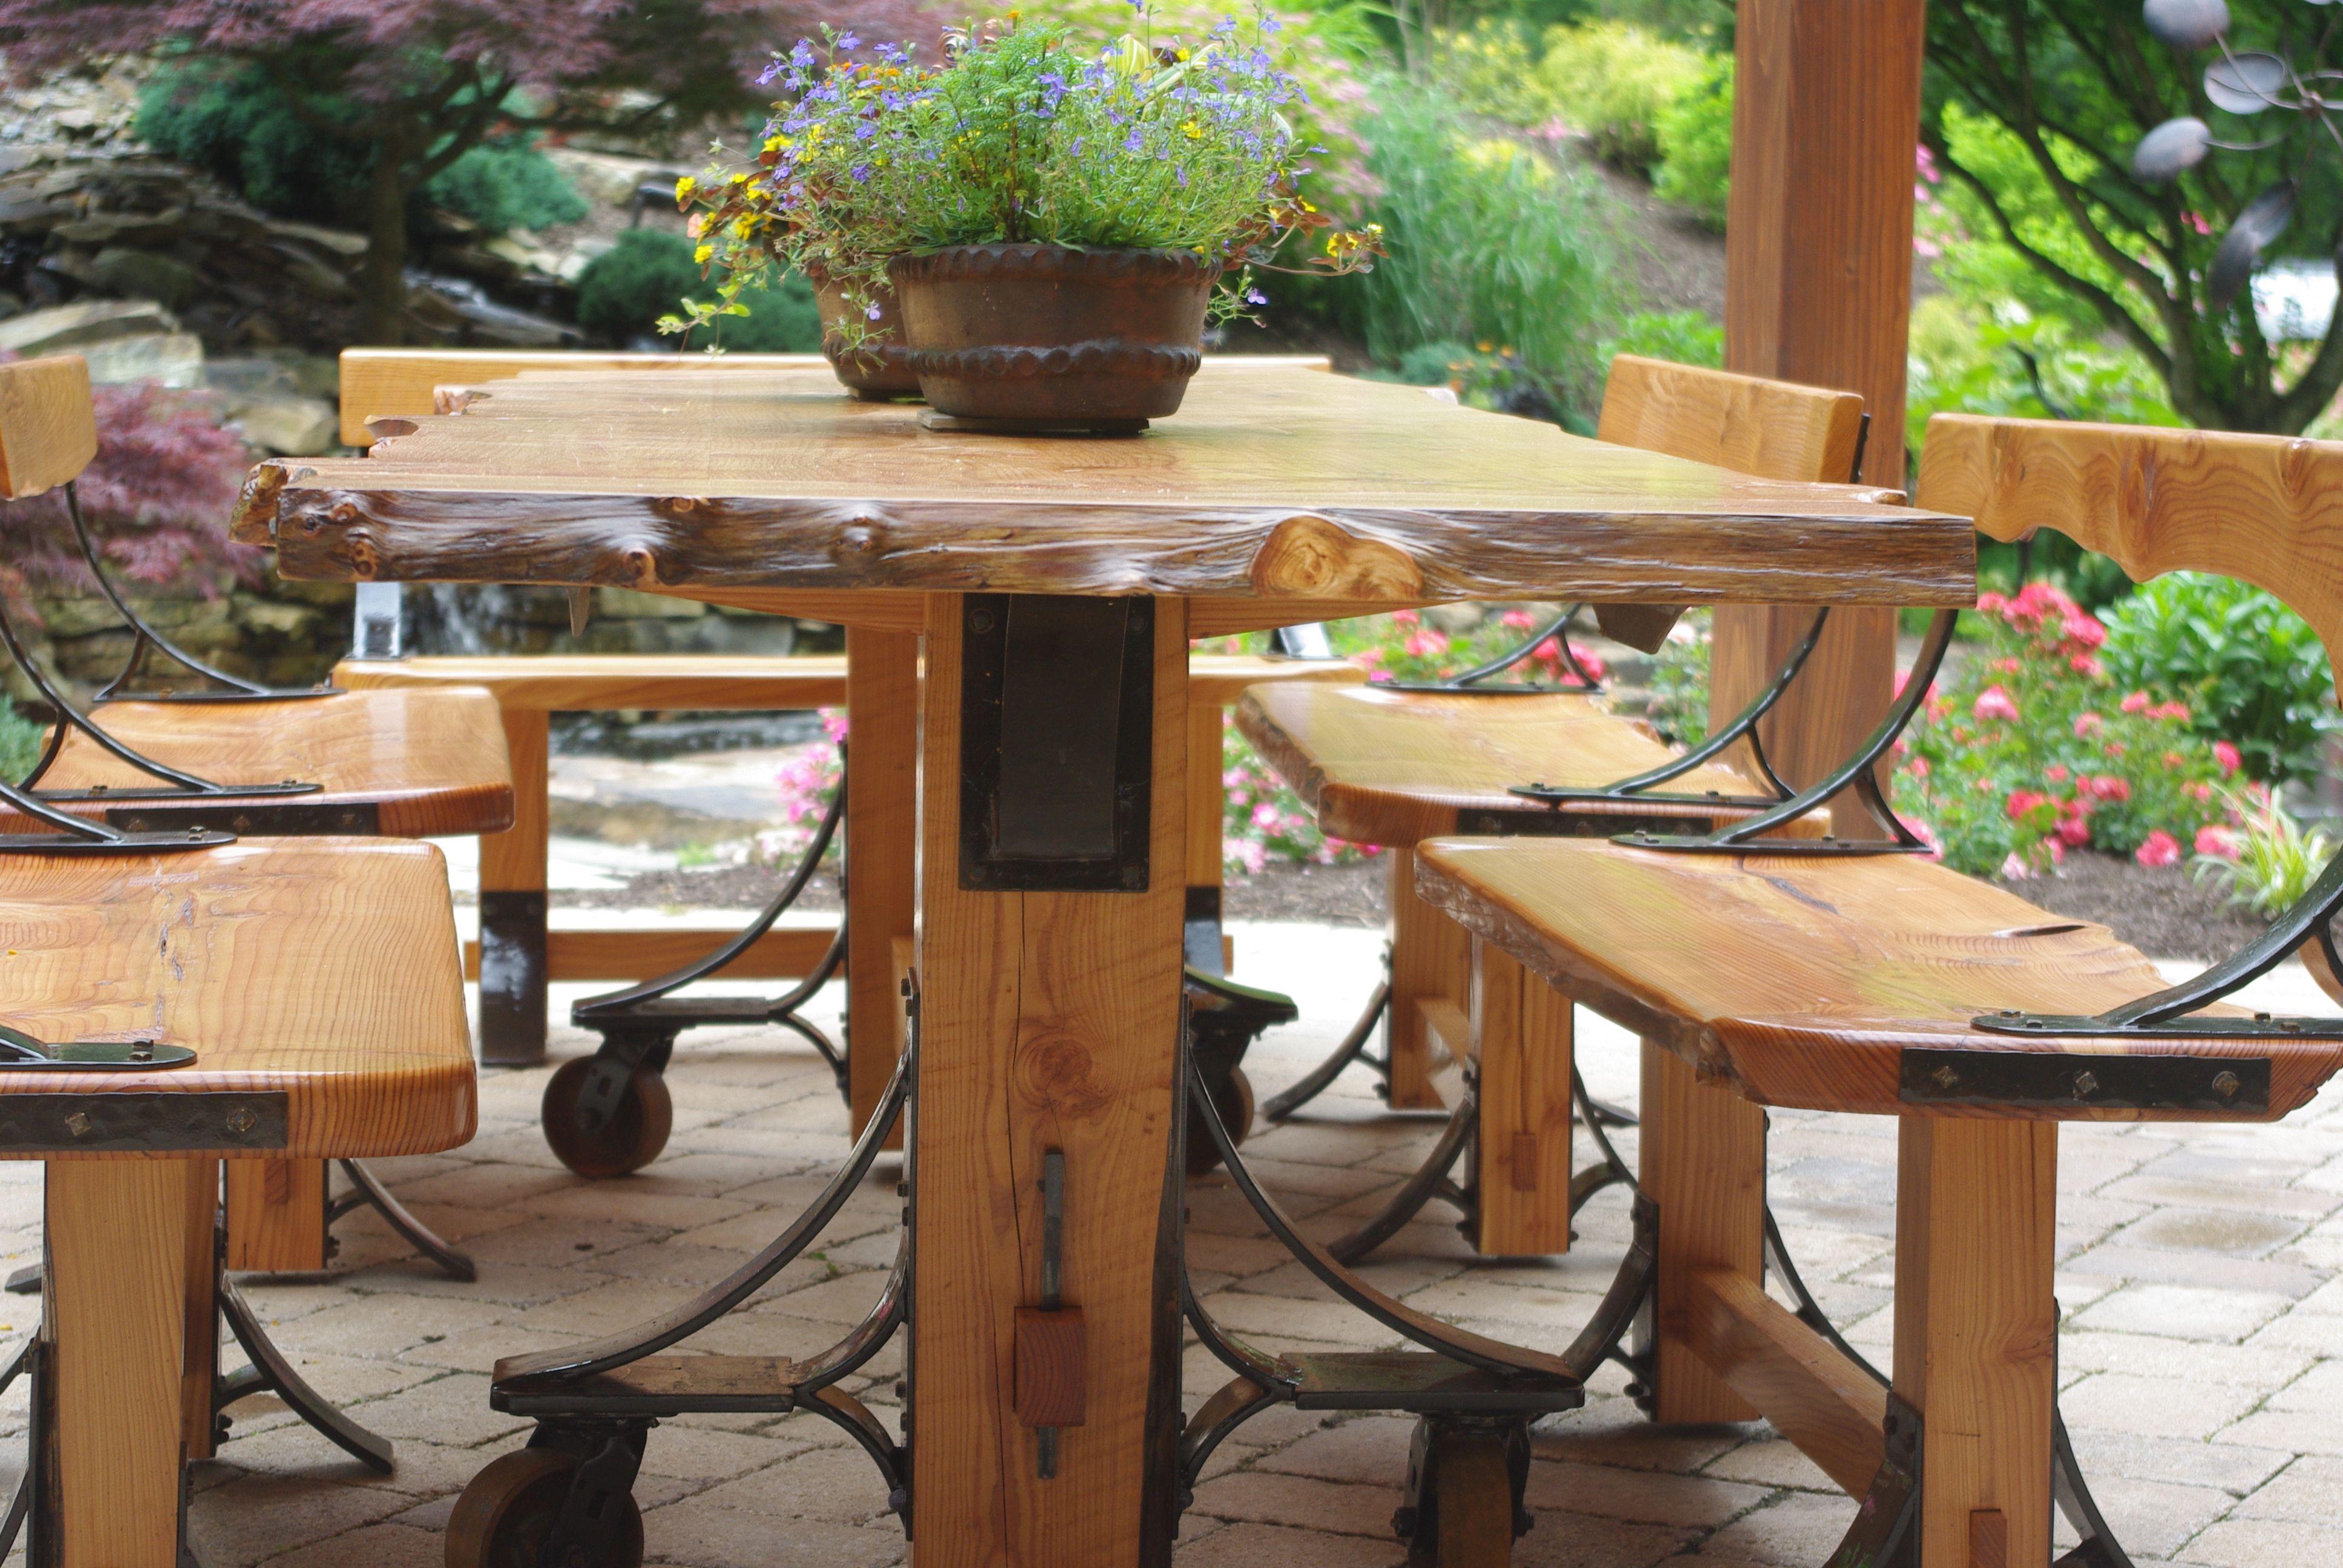 Table Lamp Design Modern Rugs